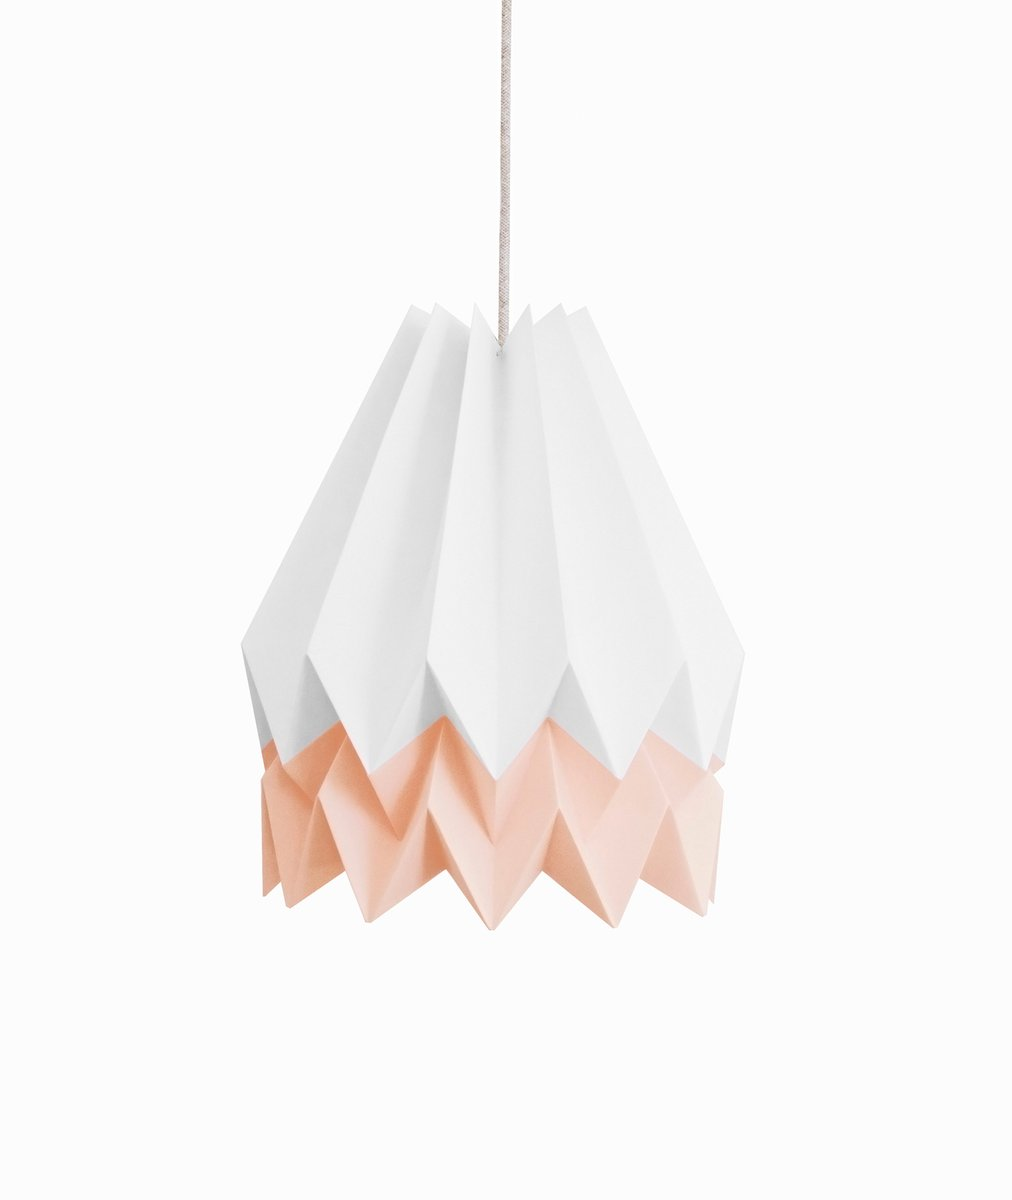 Polarweiße Origami Lampe mit pastellrosa Streifen von Orikomi